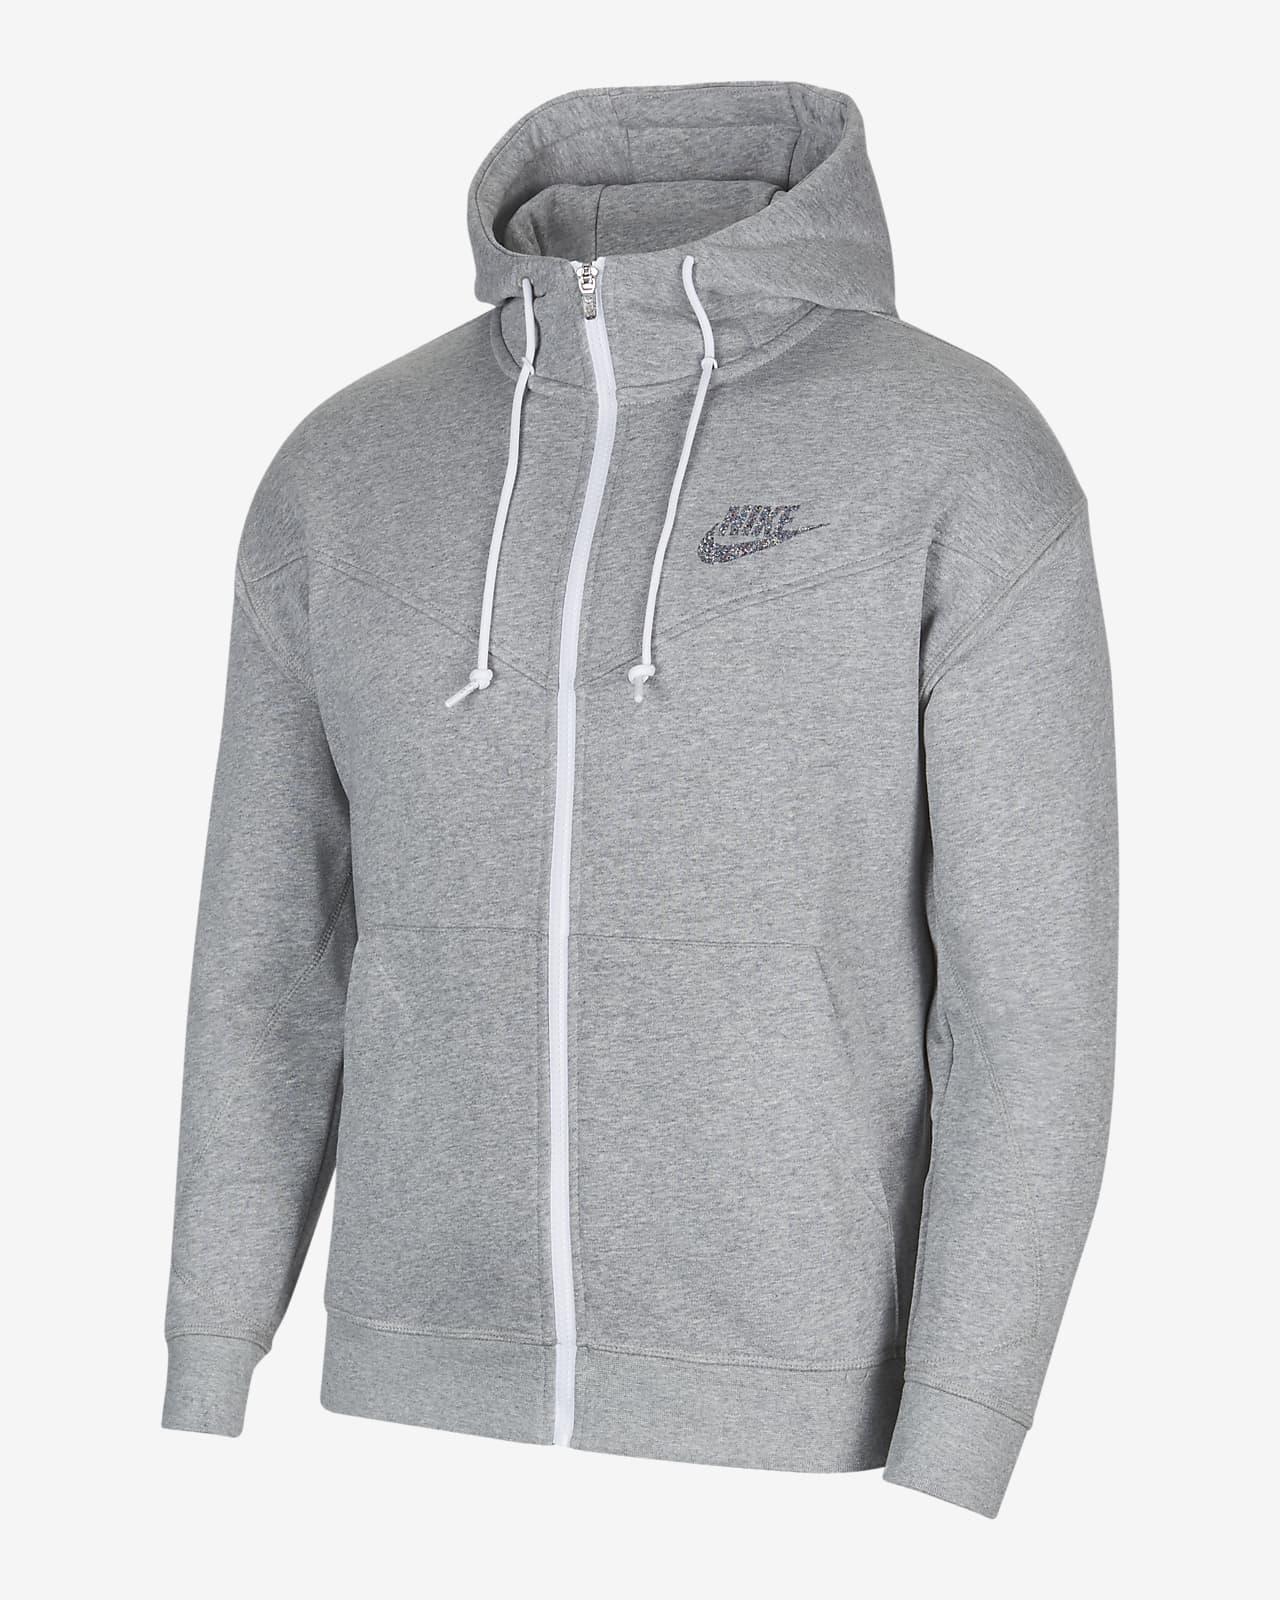 Nike Sportswear 男子连帽衫